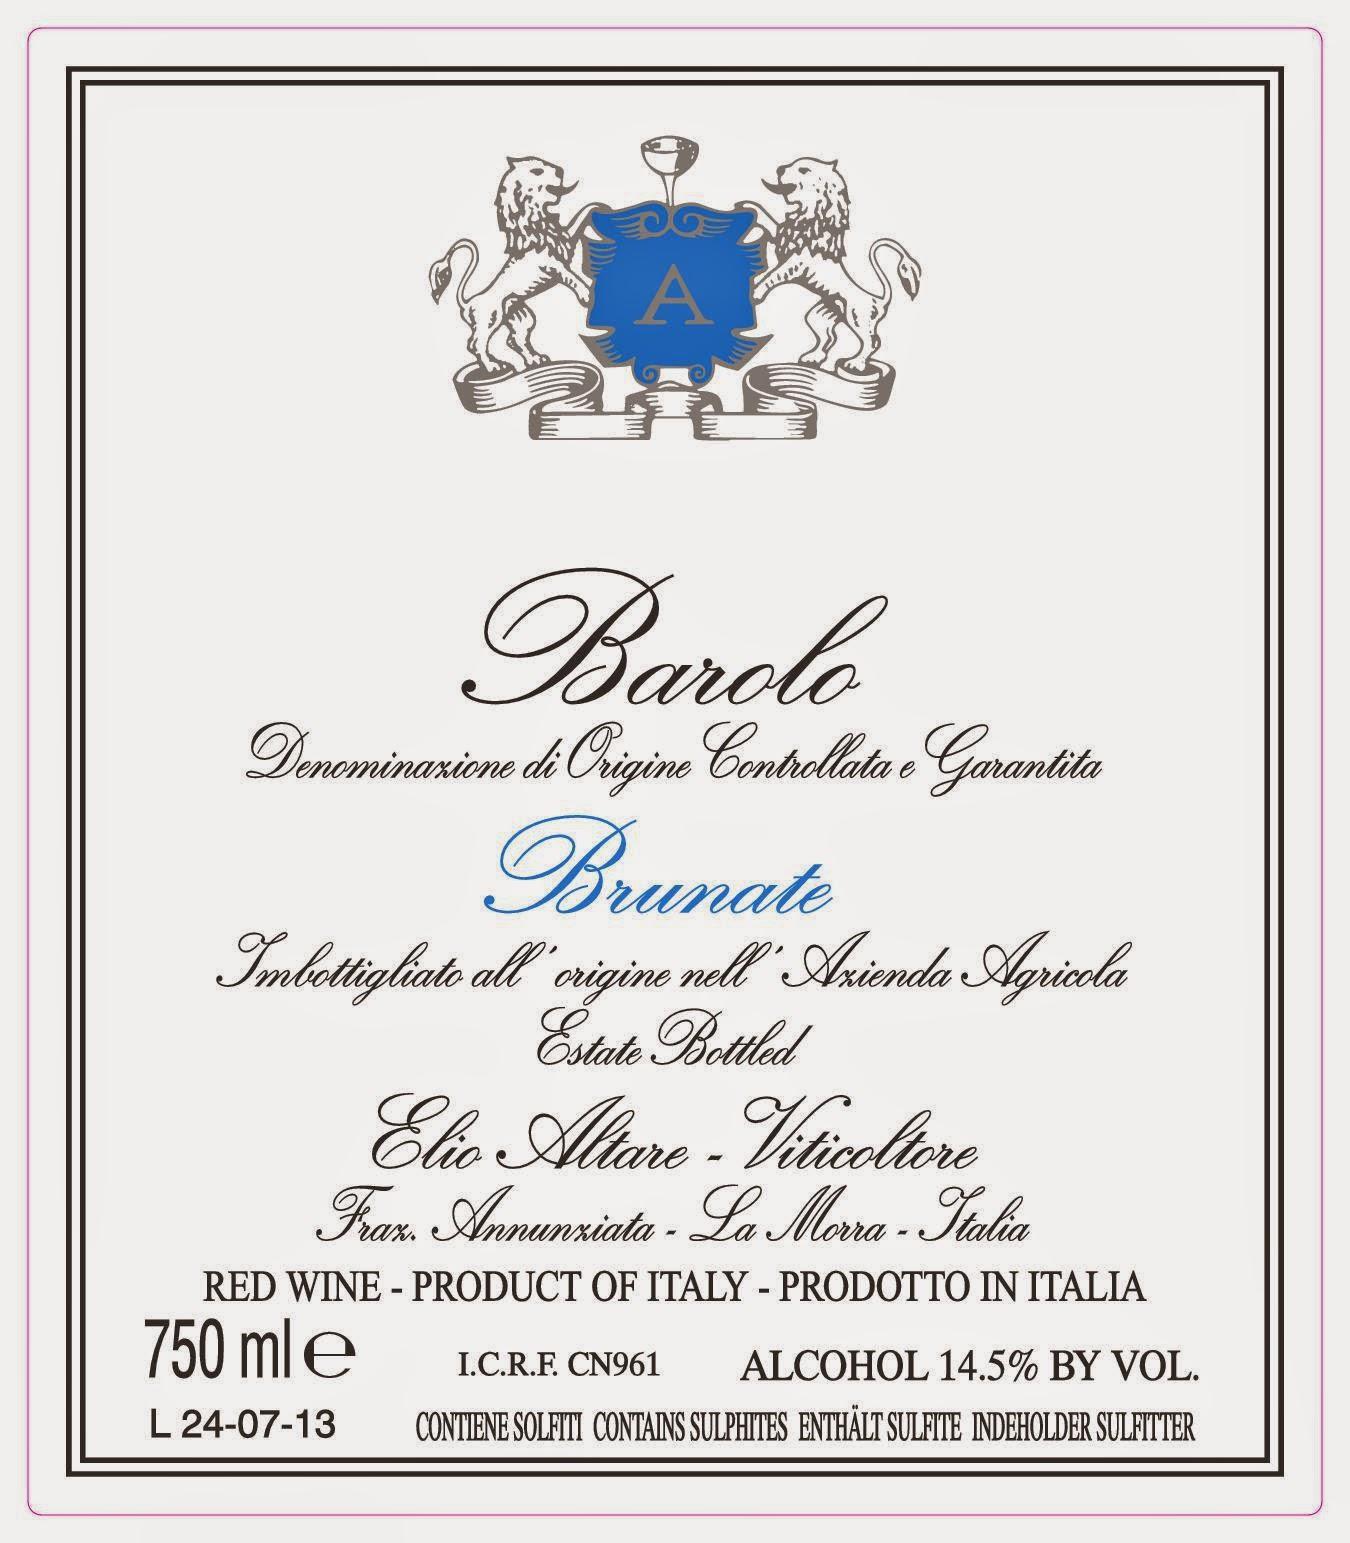 etichette branding barolo labels